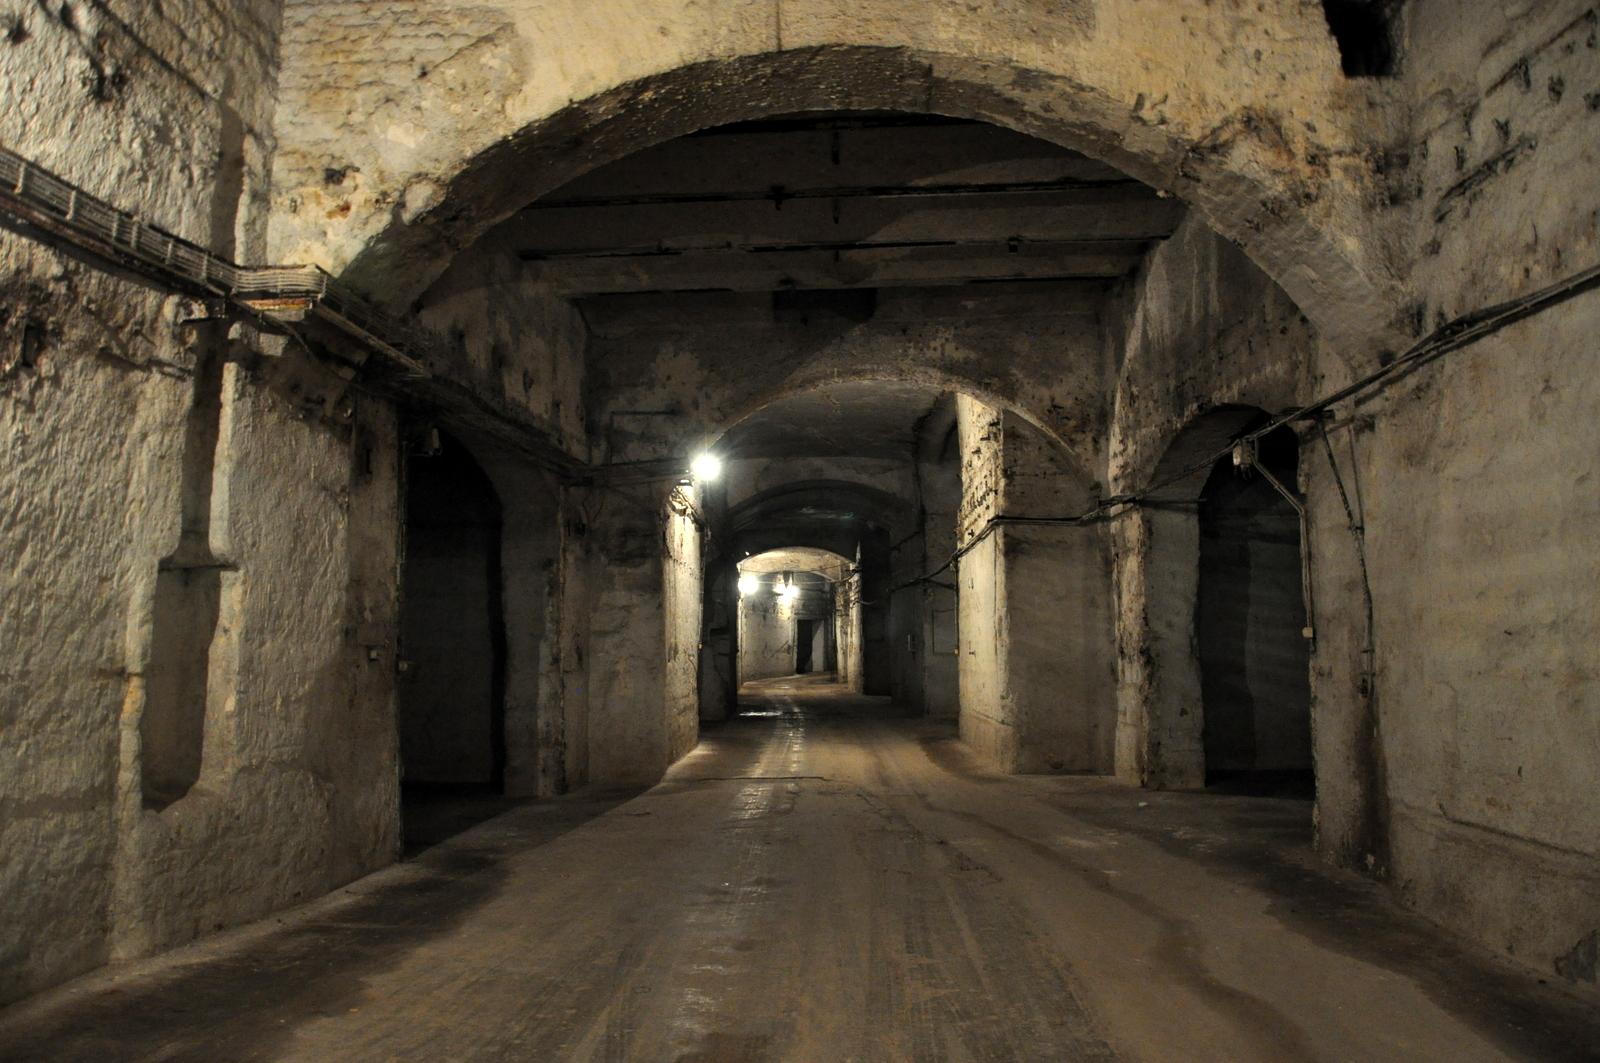 Kőbánya cellar system - Wikipedia